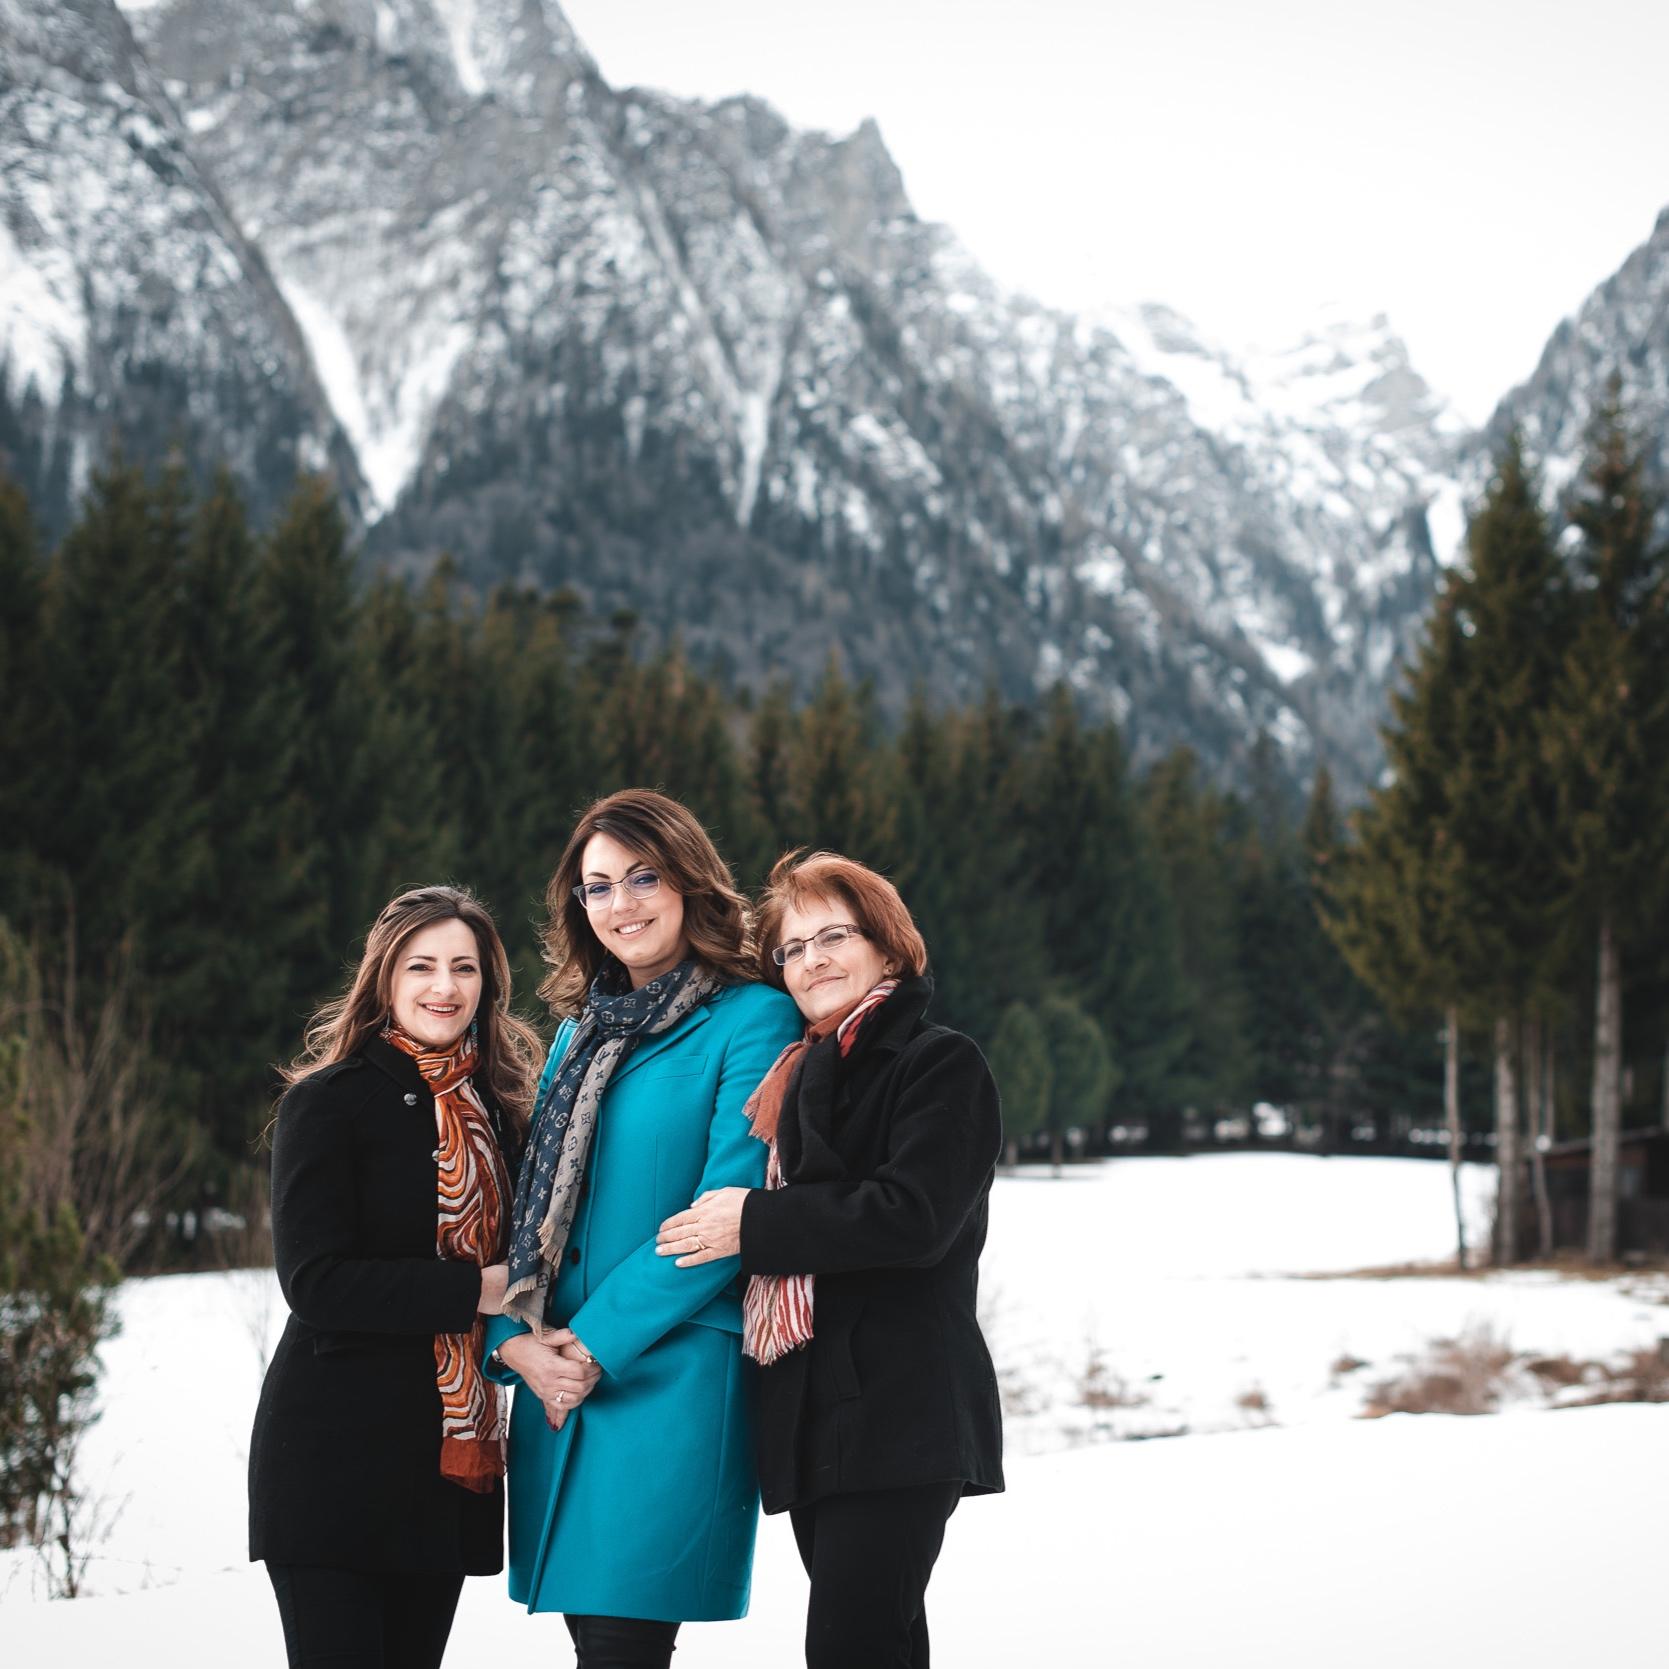 Moraru Family - Outdoor and studio ladies portraits.